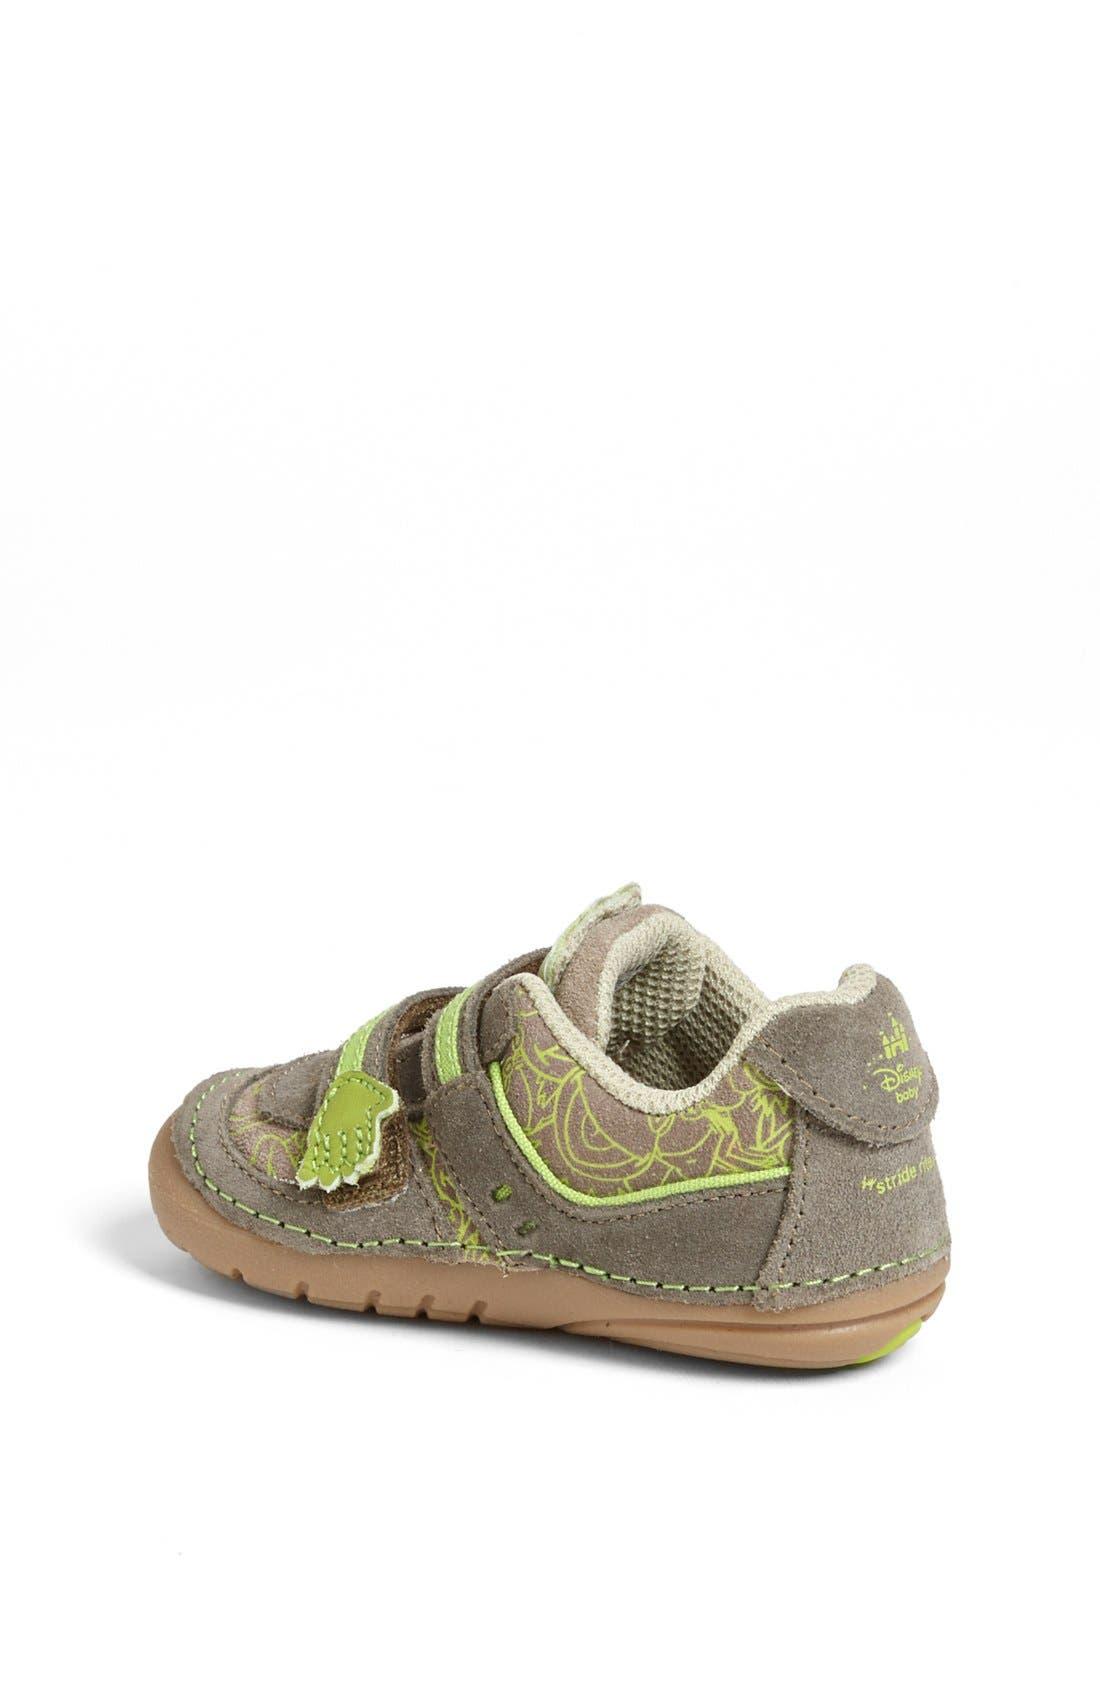 Alternate Image 2  - Stride Rite 'Kermit' Sneaker (Baby & Walker)